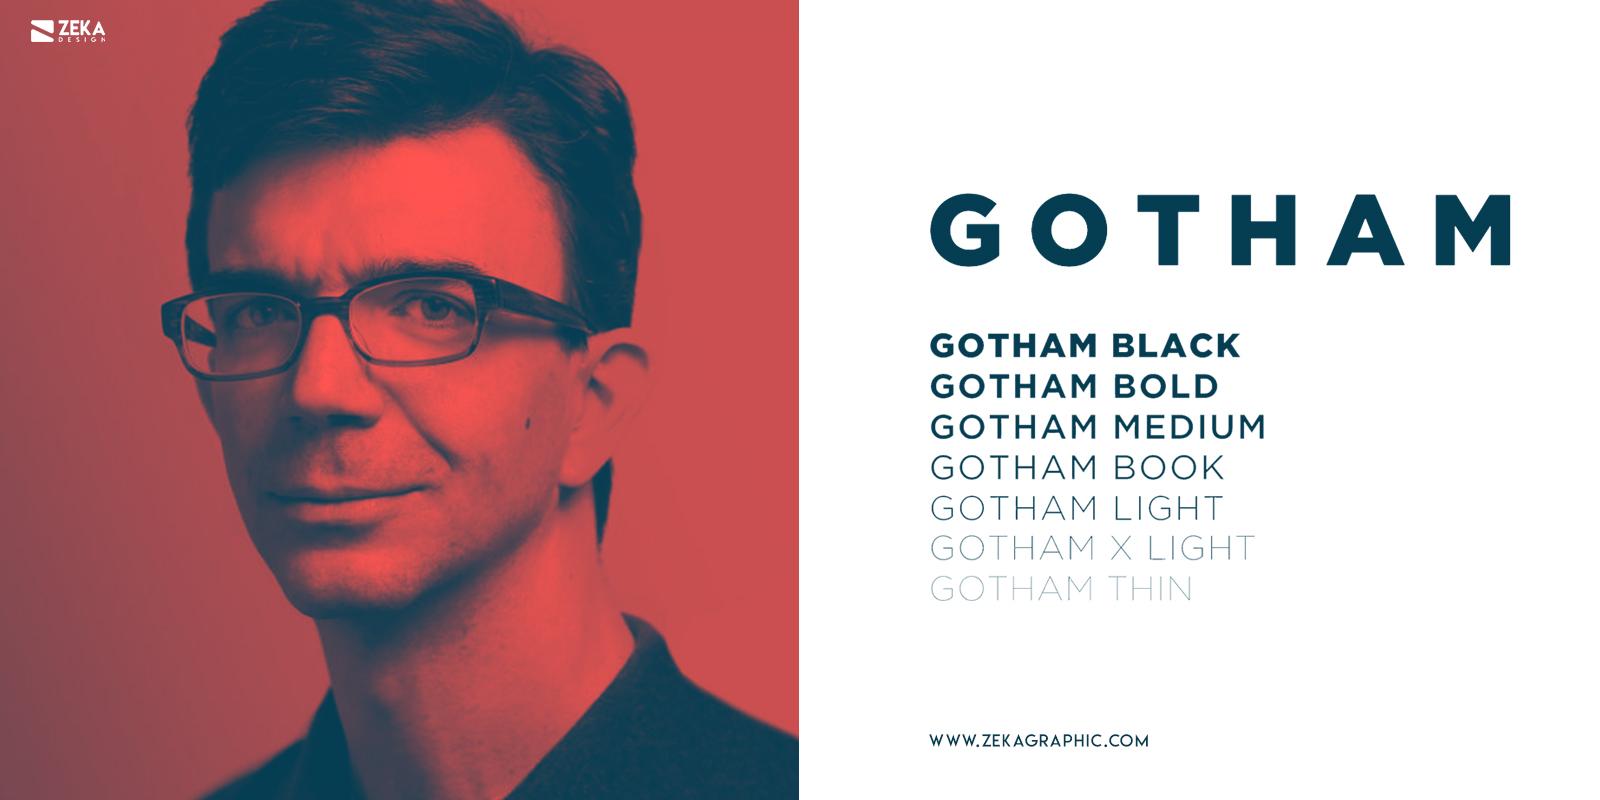 Gotham Fonts Every Graphic Designer Should Have